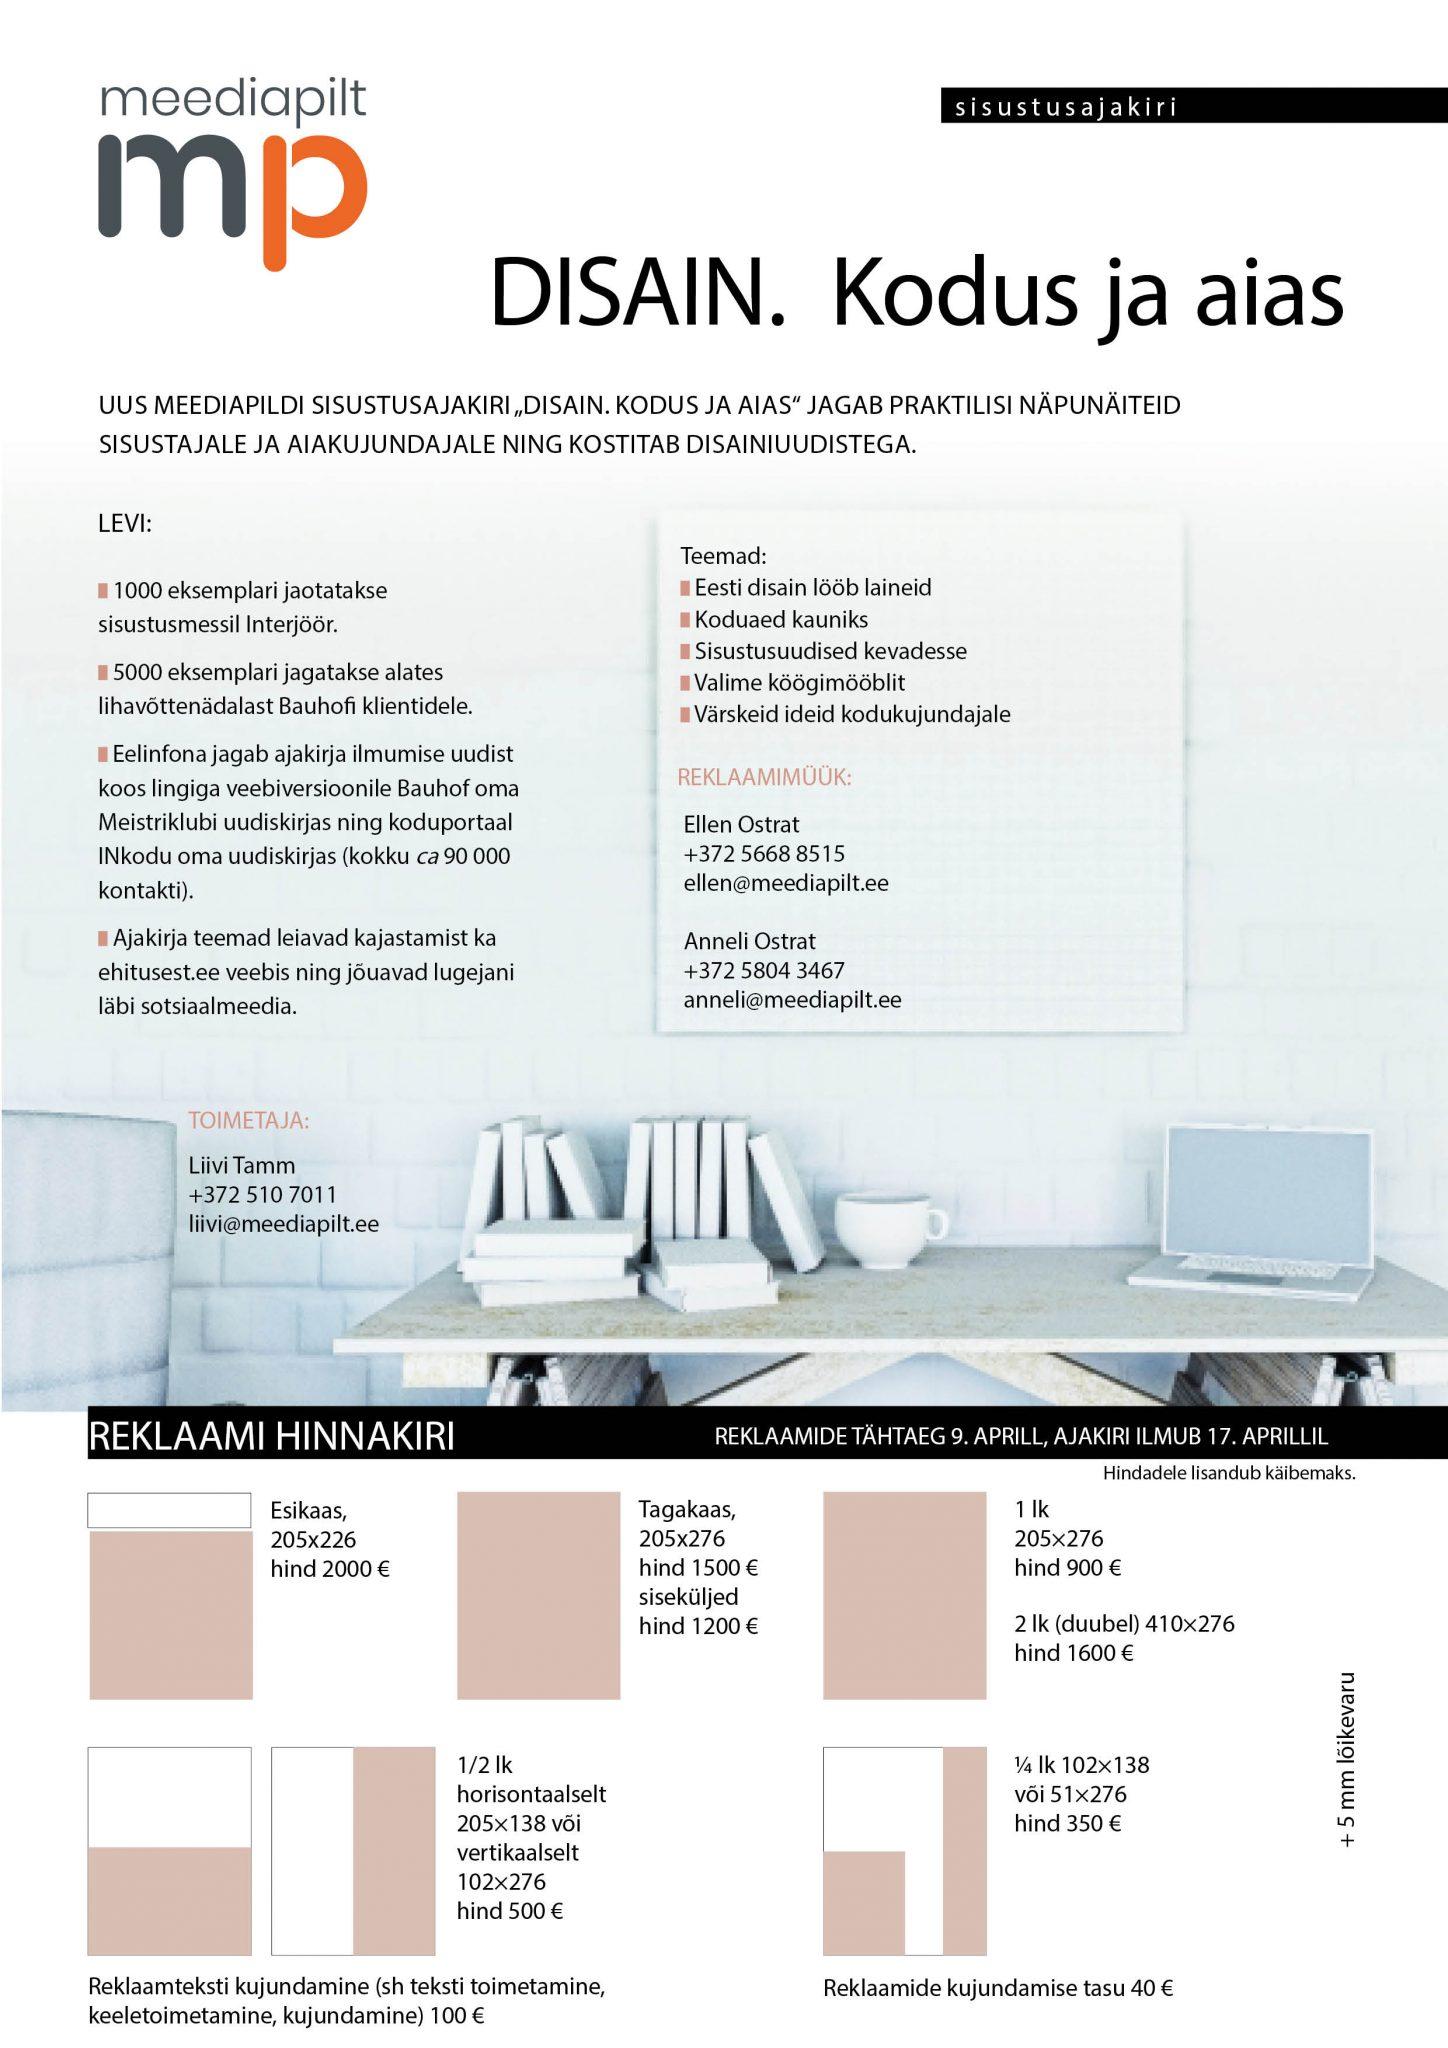 Disain. Kodus ja aias. 2019. Meediakaart